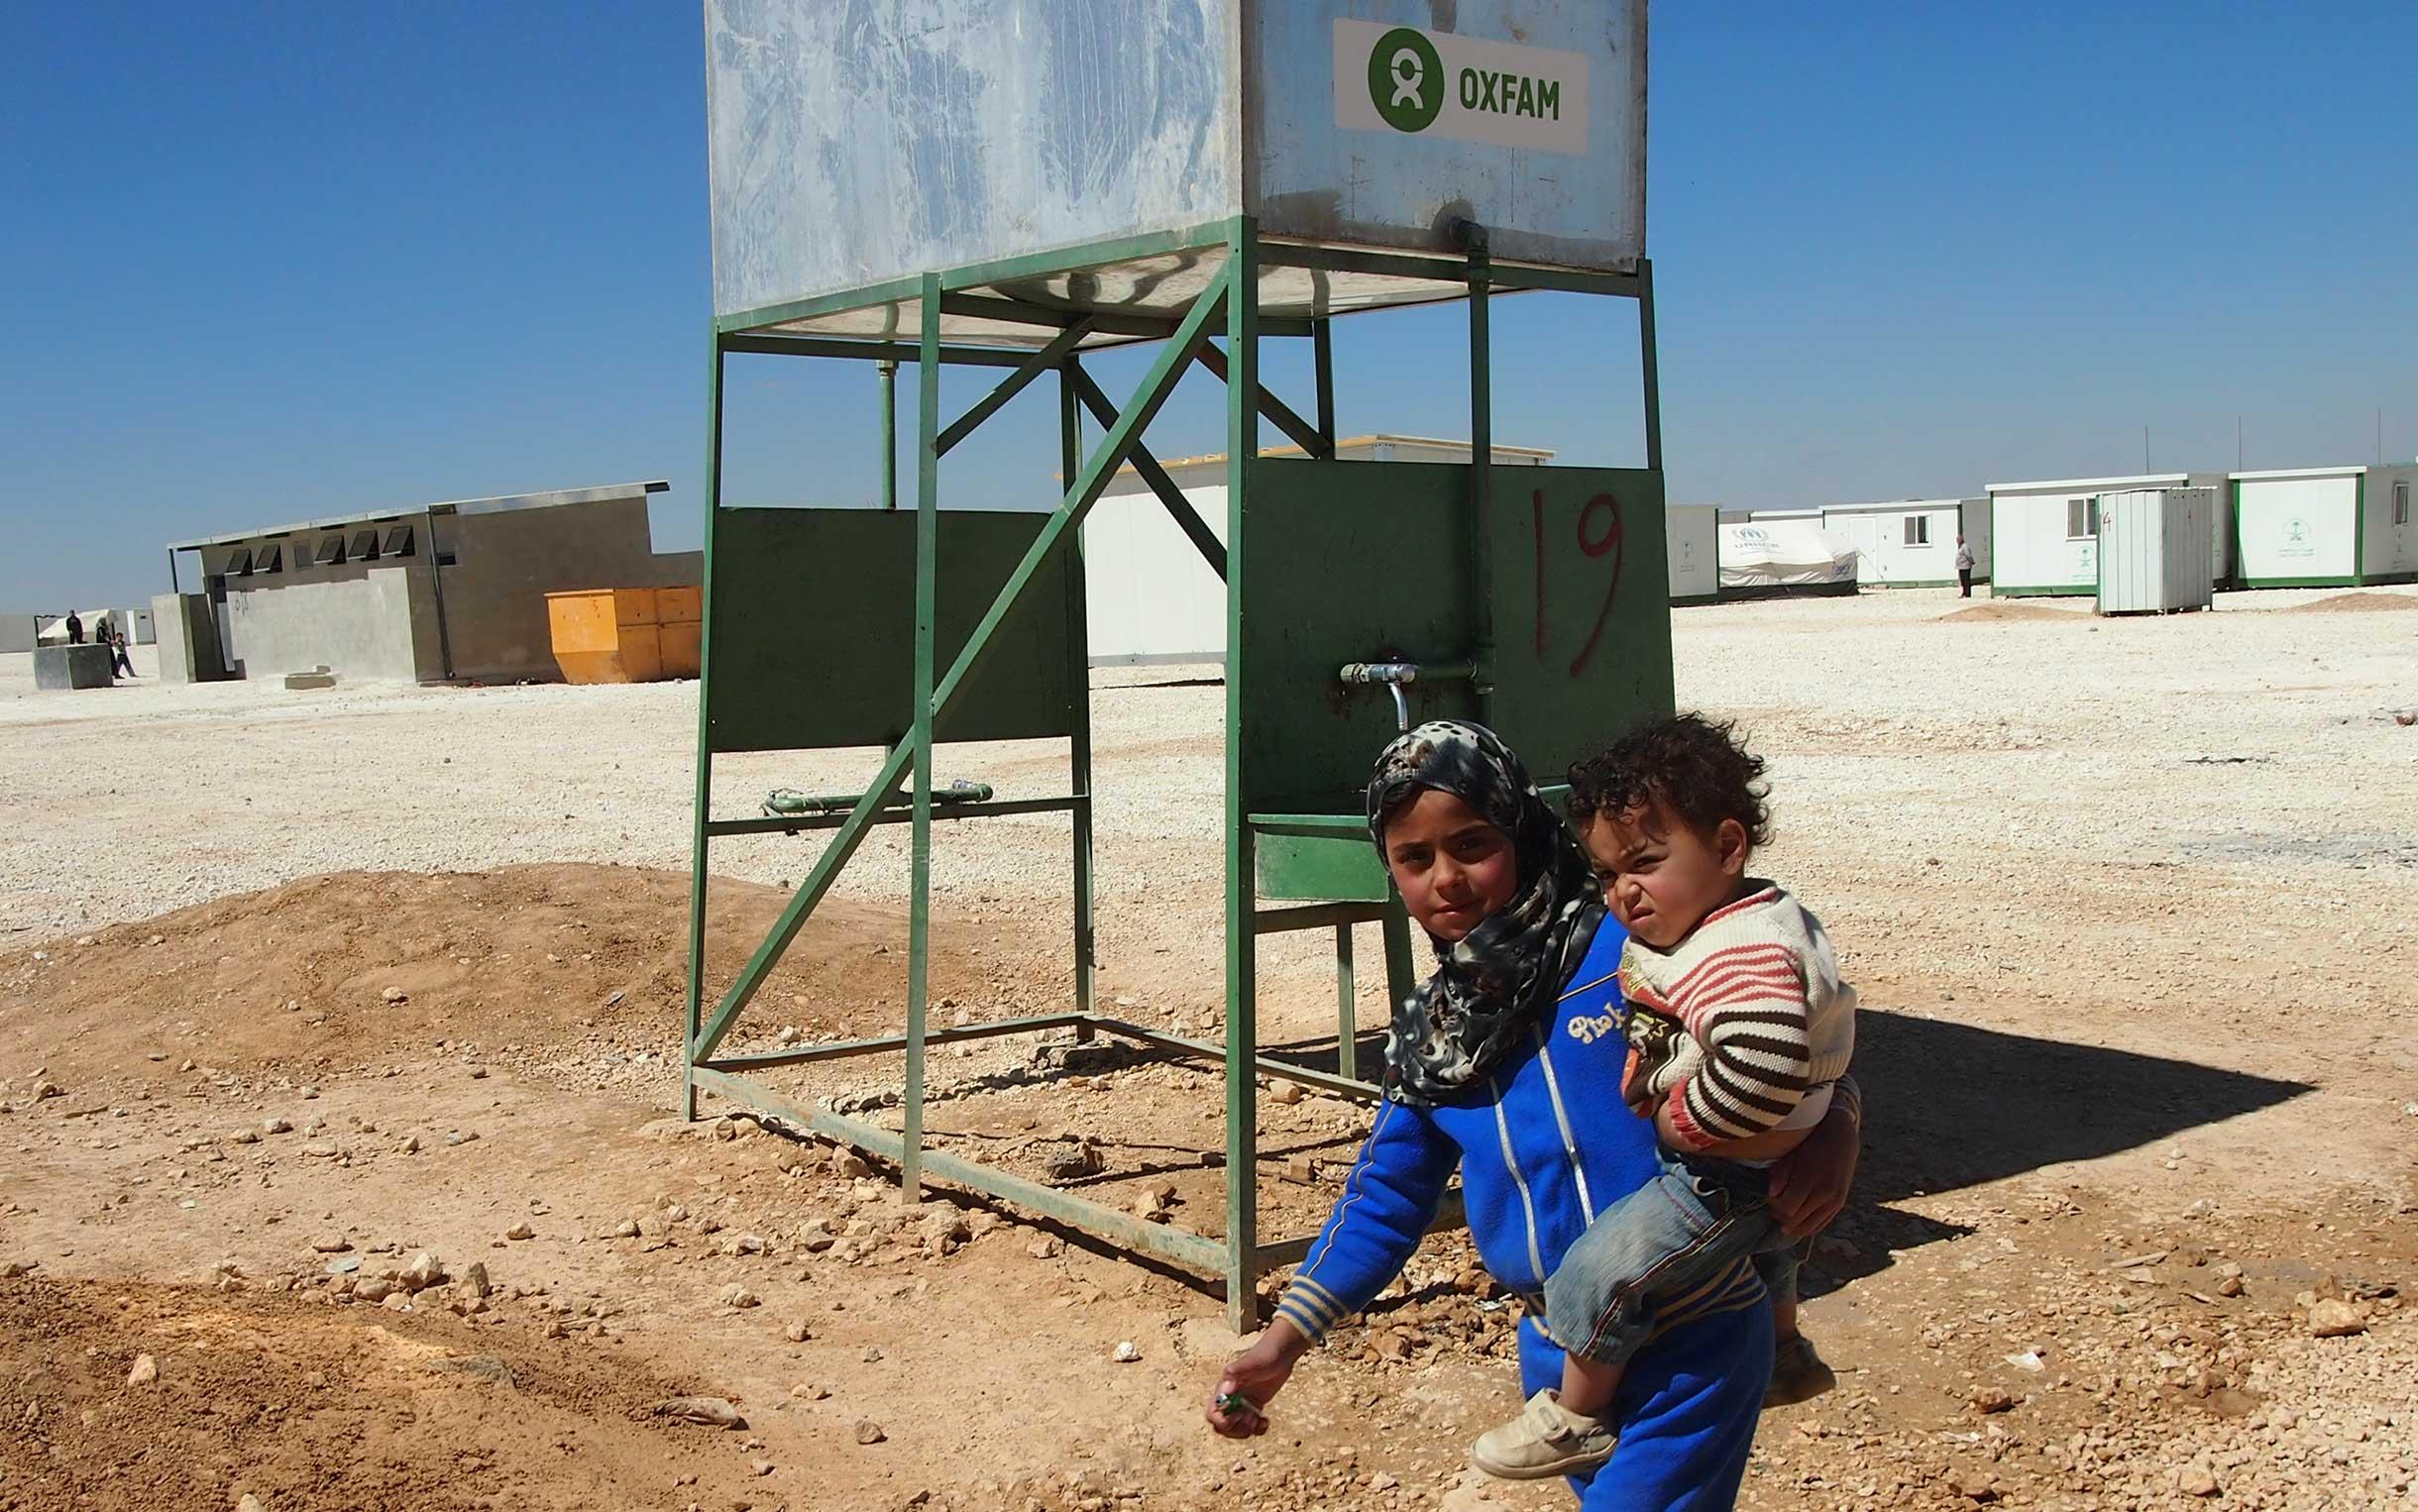 Oxfam responding to the Syria refugee crisis